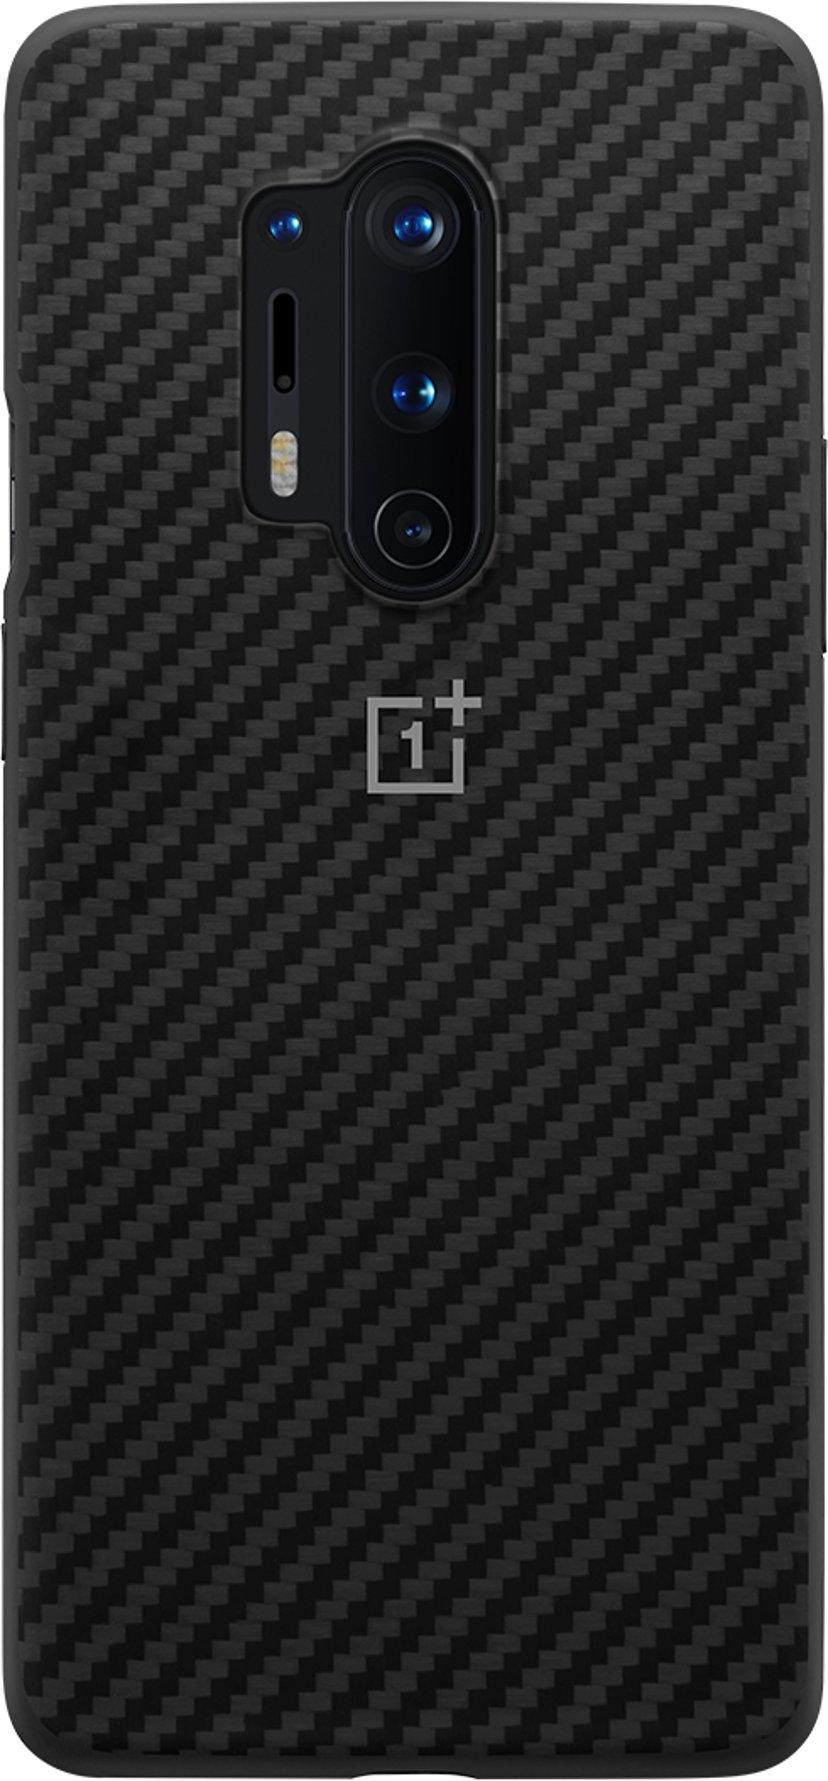 OnePlus Bumper Case OnePlus 8 Pro Karbon